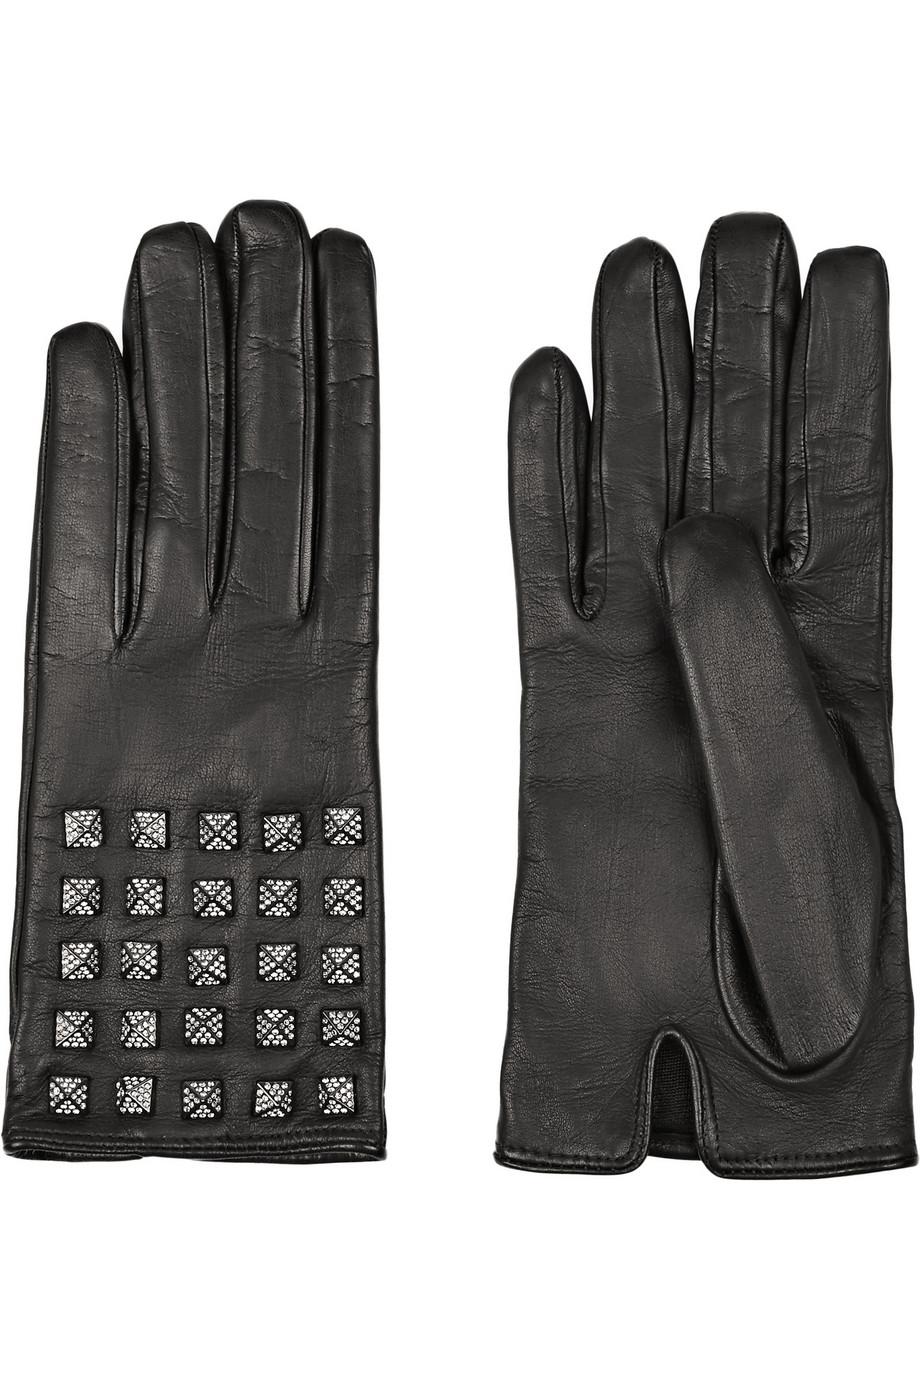 Valentino Pave Studded Leather Gloves $745.25